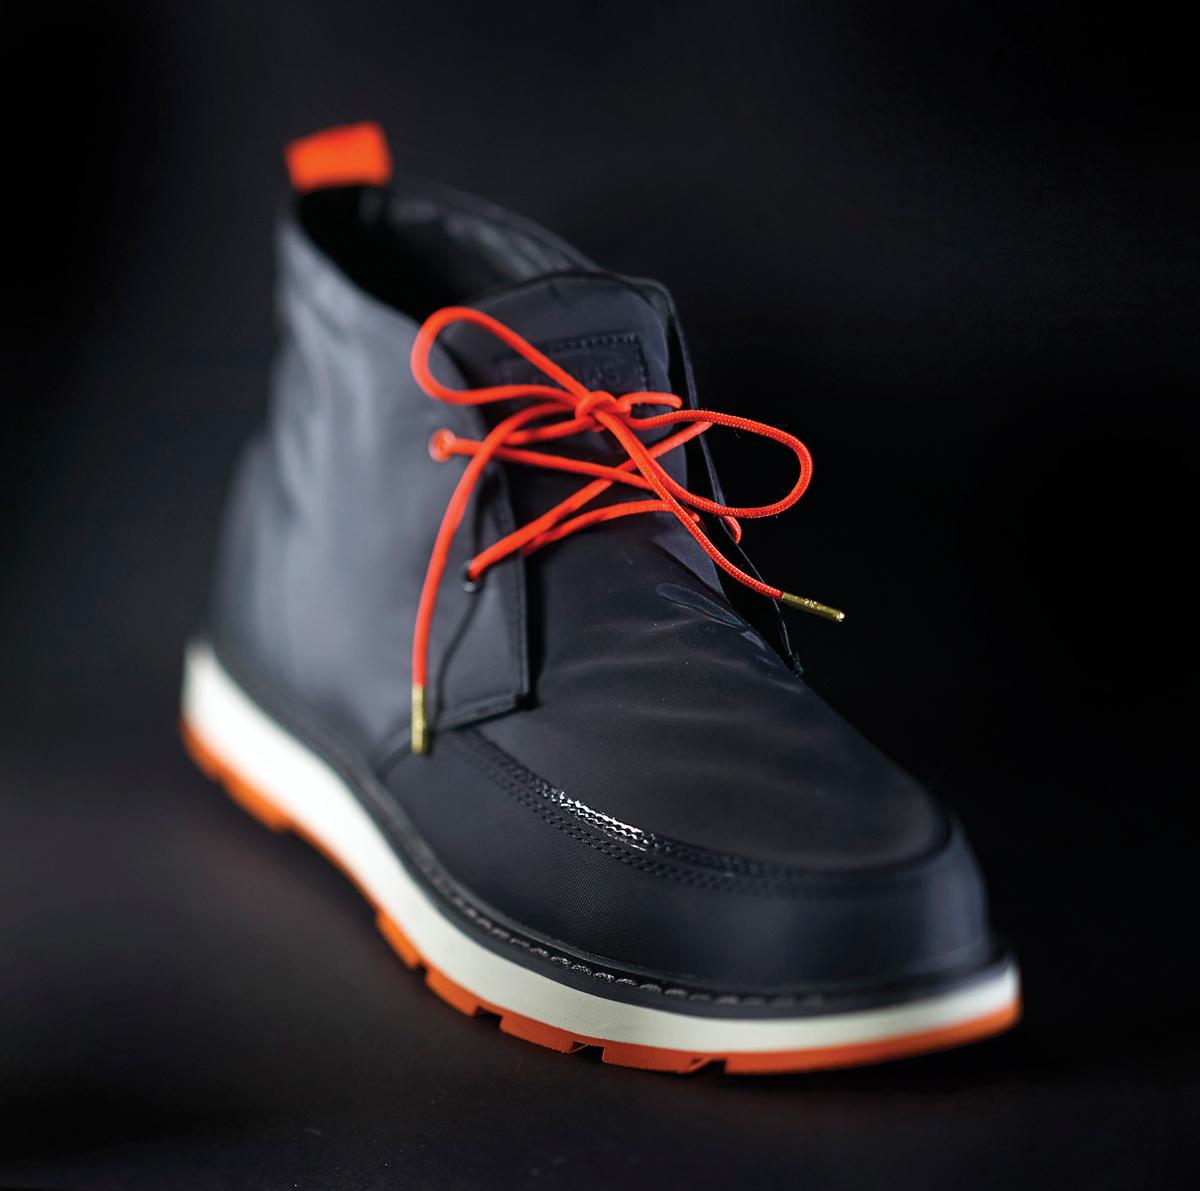 m13-accessoires-lui-chaussures-swims